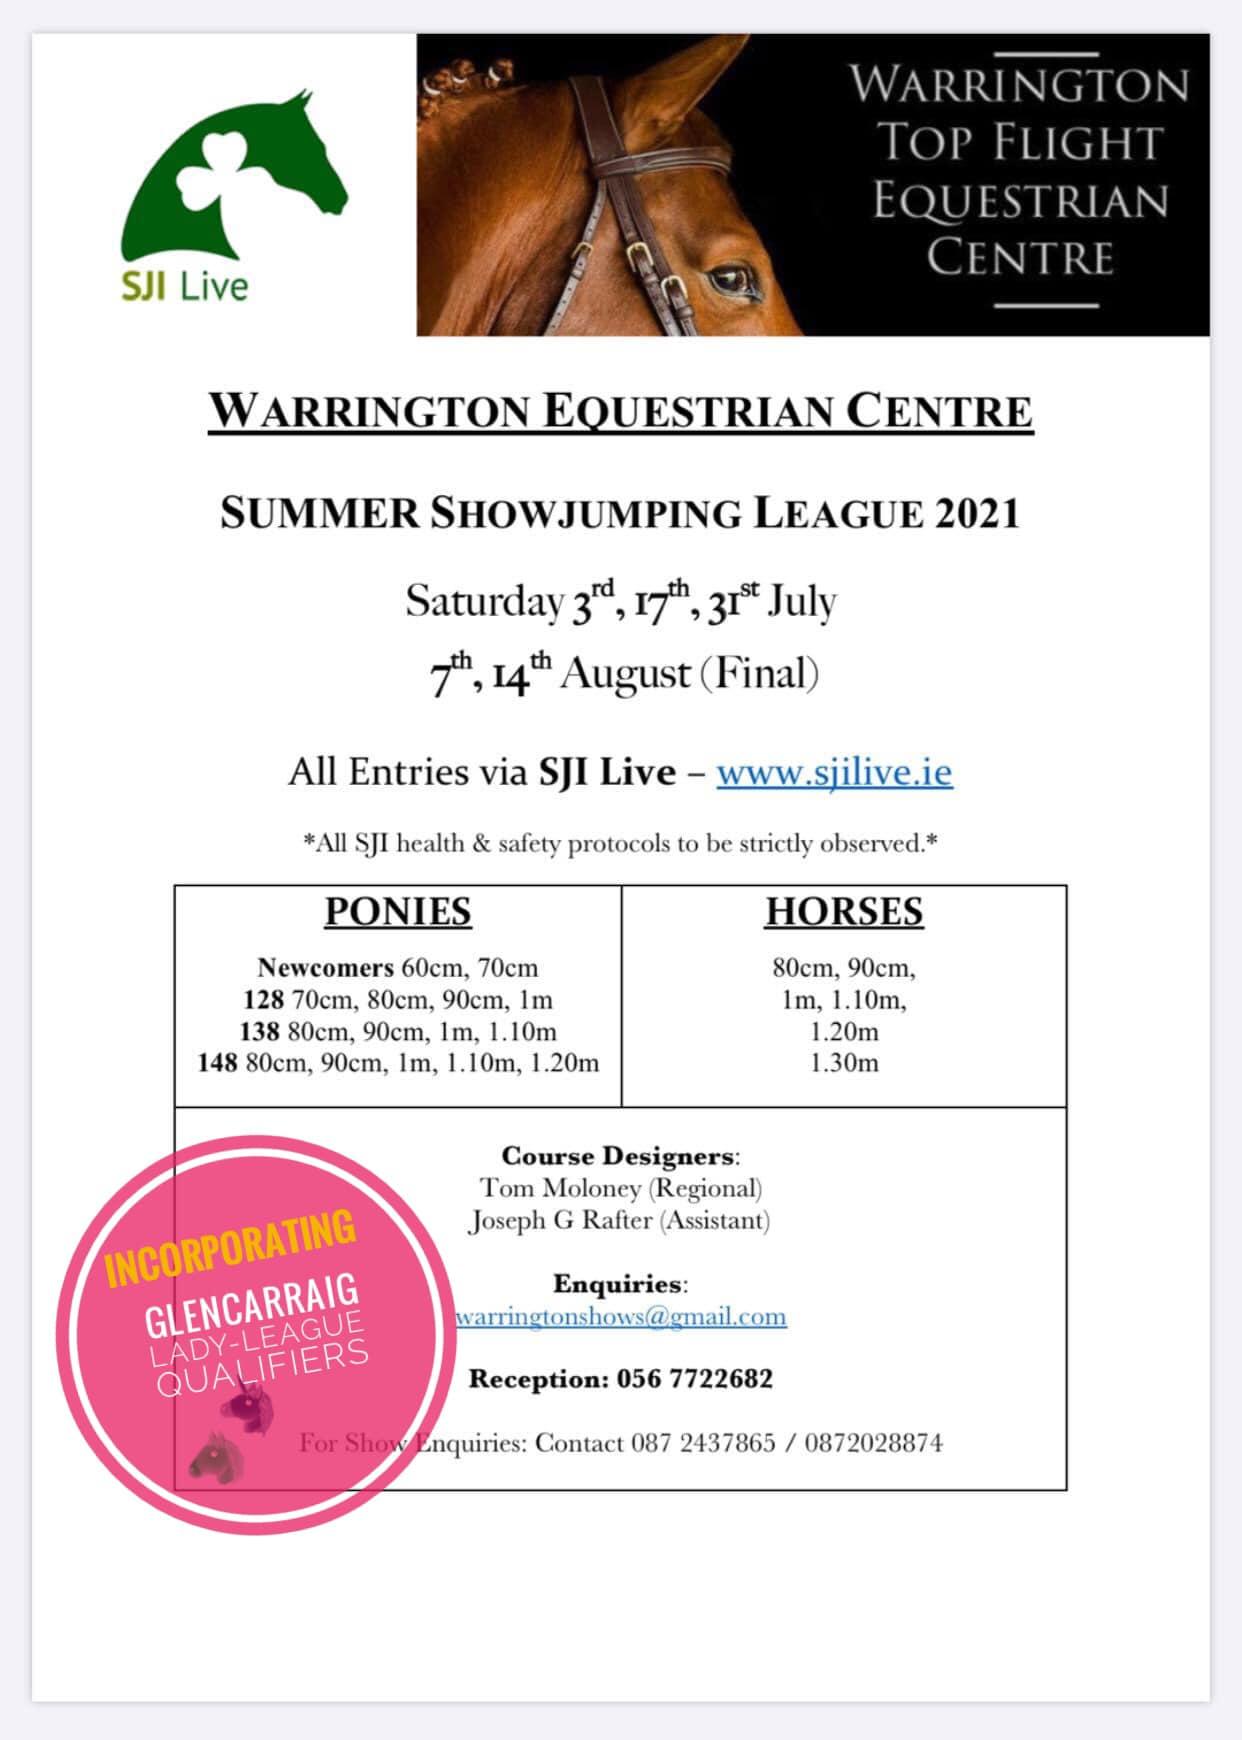 Summer Showjumping League